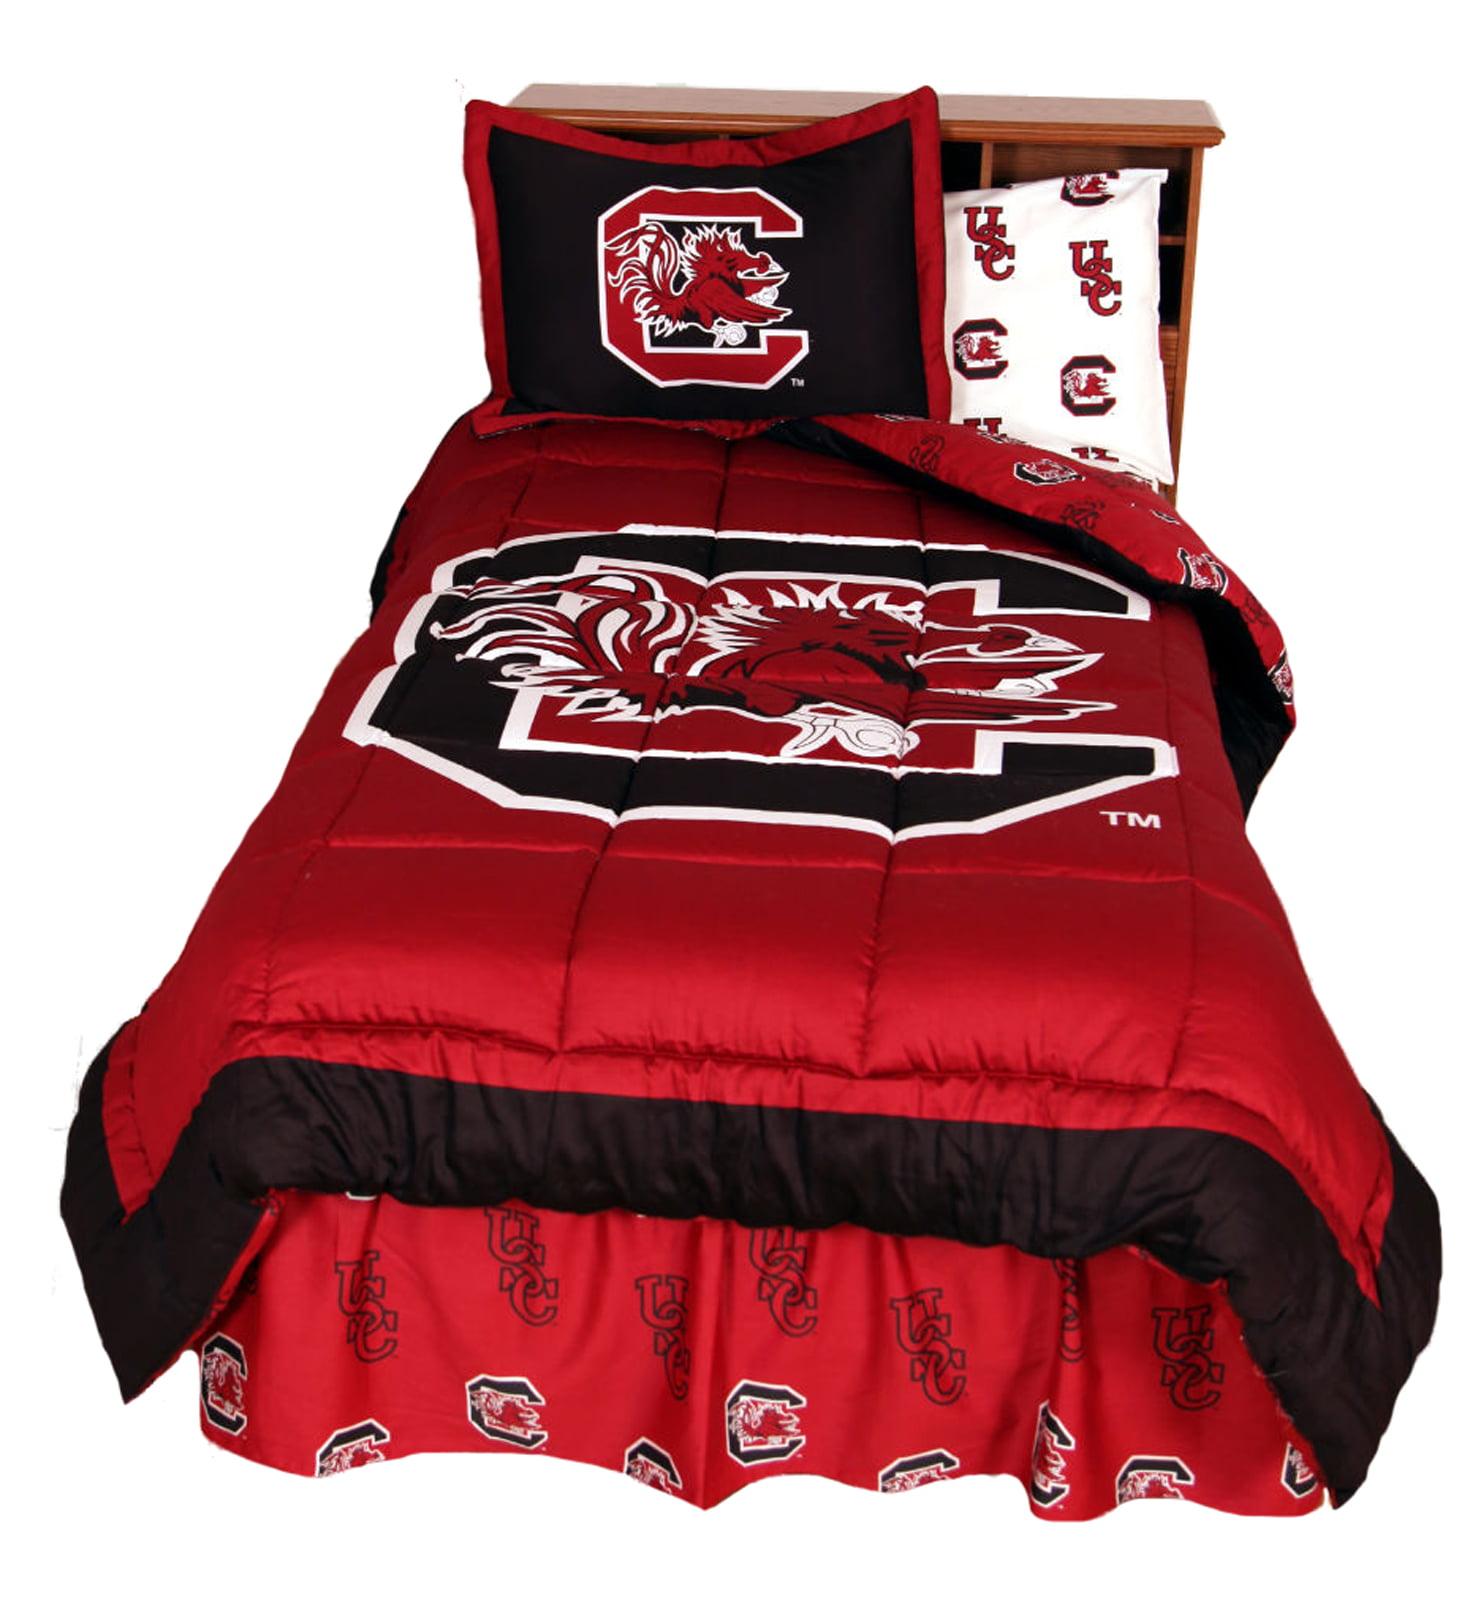 South Carolina Gamecocks 2 Pc Comforter Set, 1 Comforter, 1 Sham, Twin